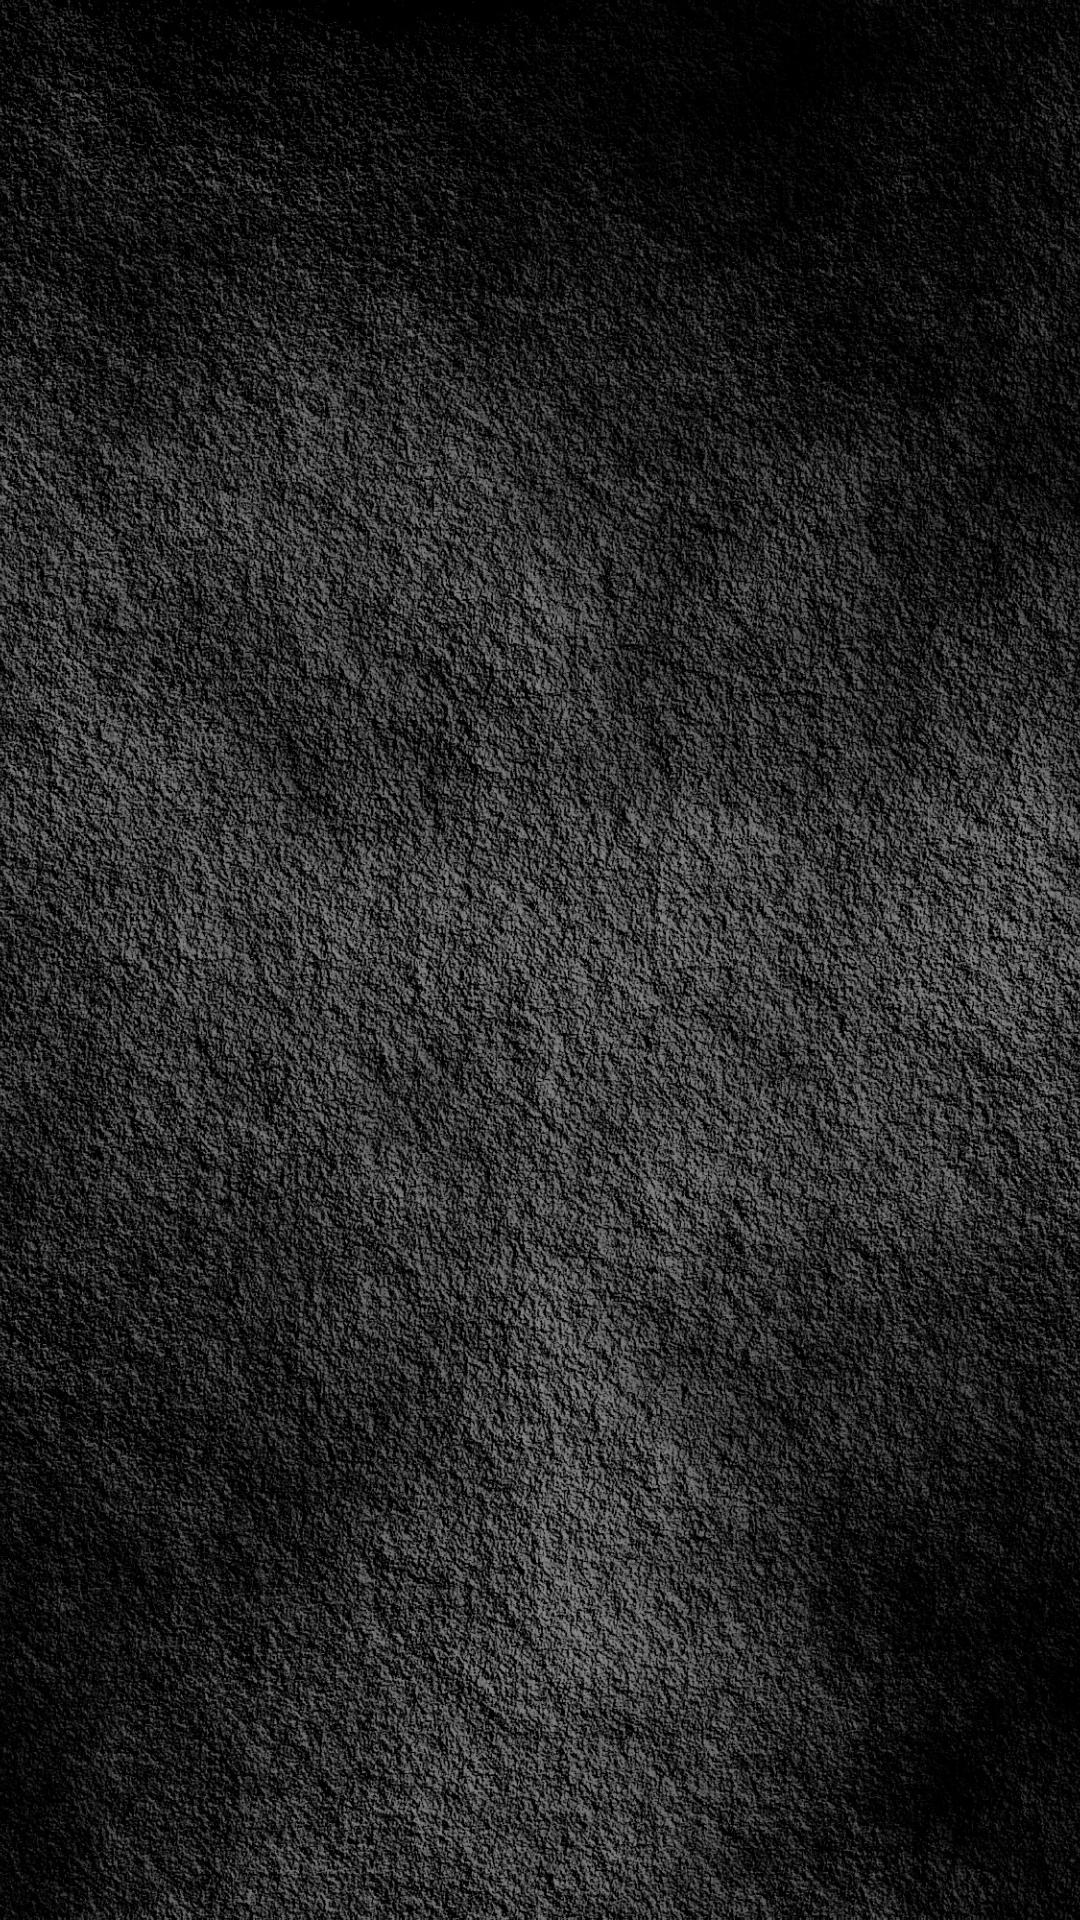 Heavy rock iphone hd wallpaper iphone wallpaper for Sfondi full hd per smartphone